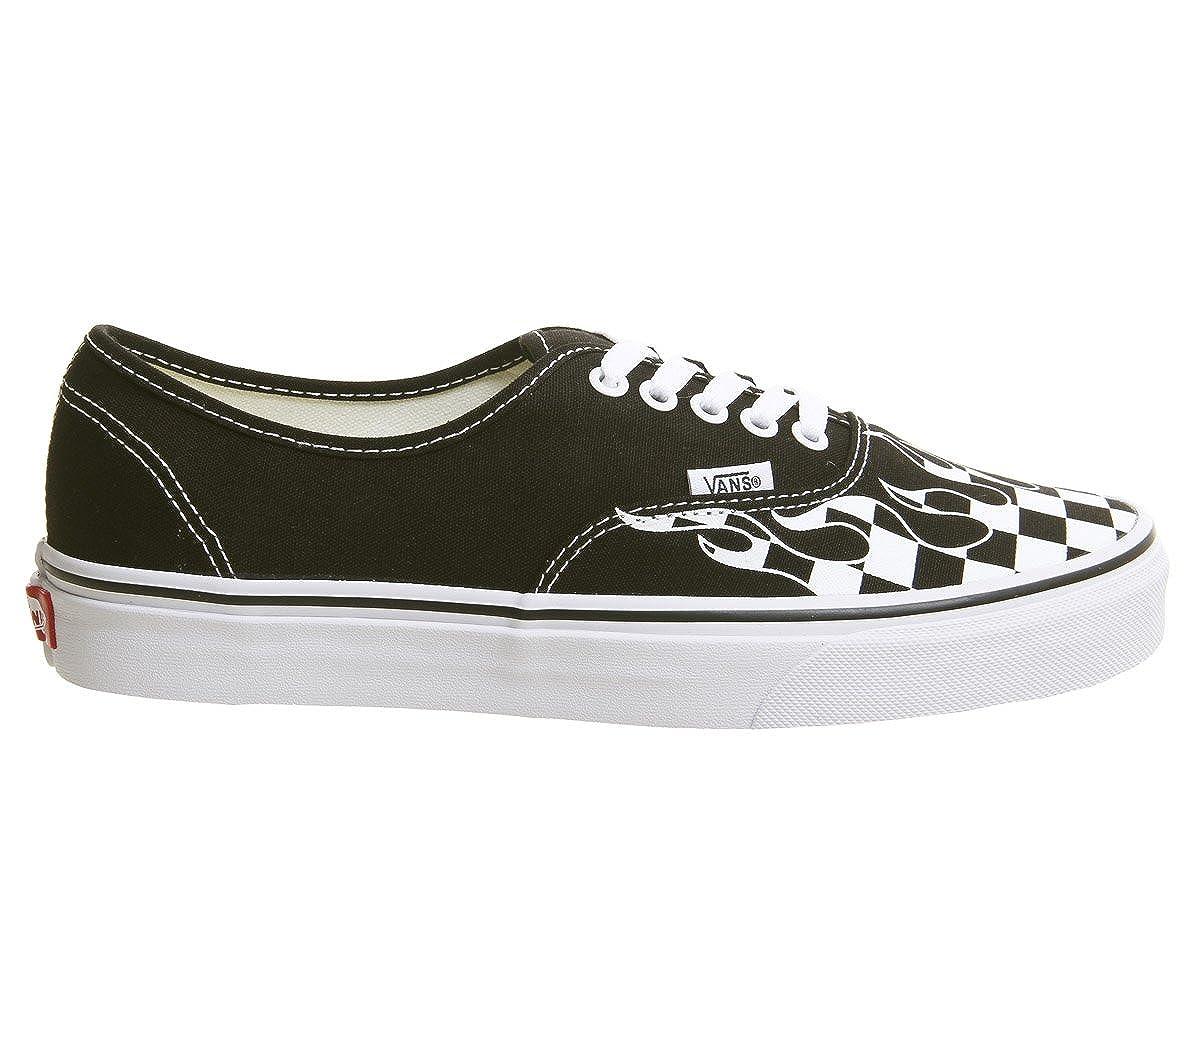 Vans Checker AUTHENTIC, Unisex Erwachsene Sneakers Checker Vans Flame schwarz true Weiß 45071f